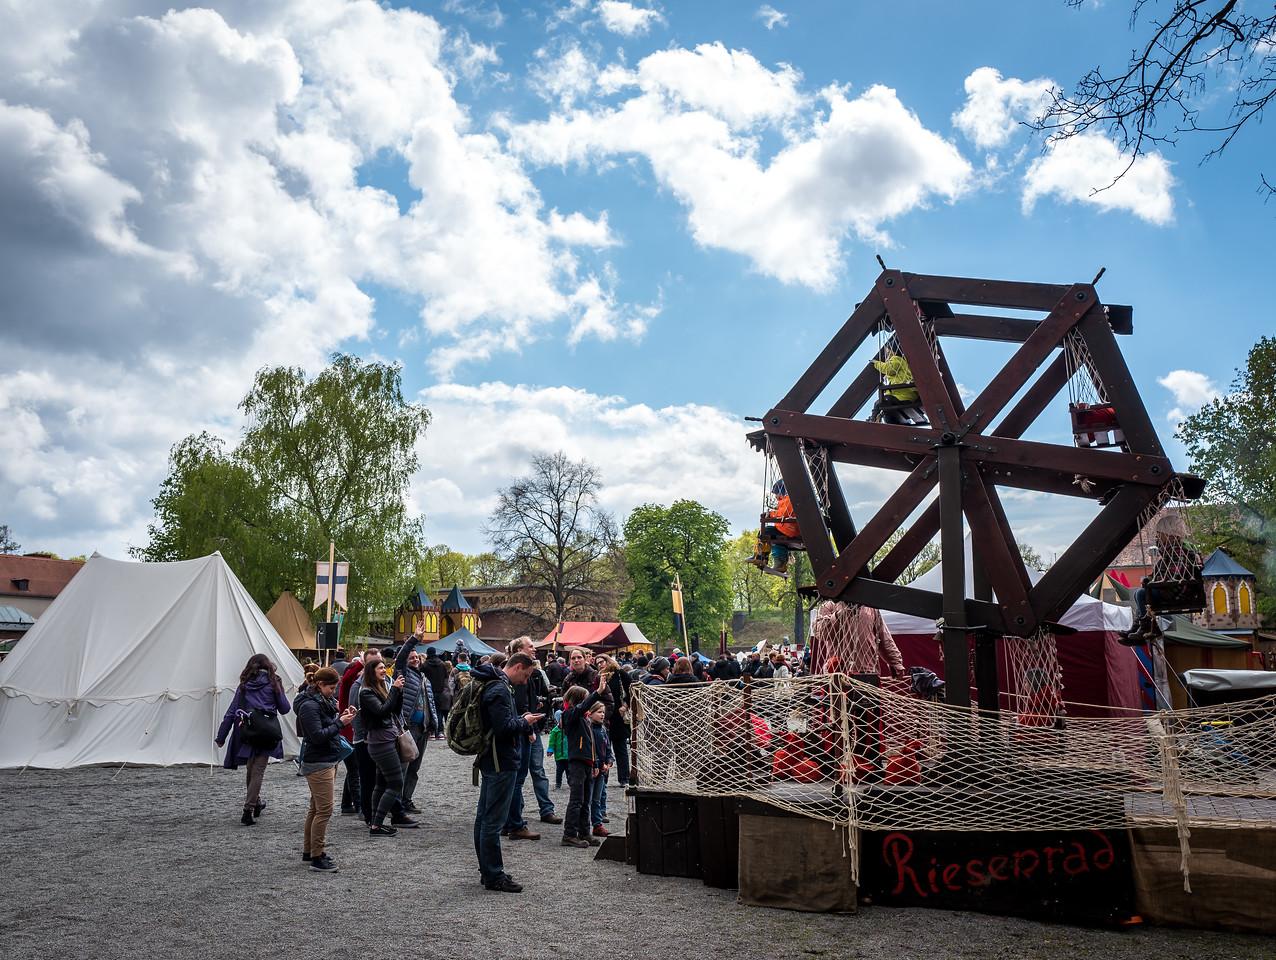 Medieval fair in Spandauer Zitadelle